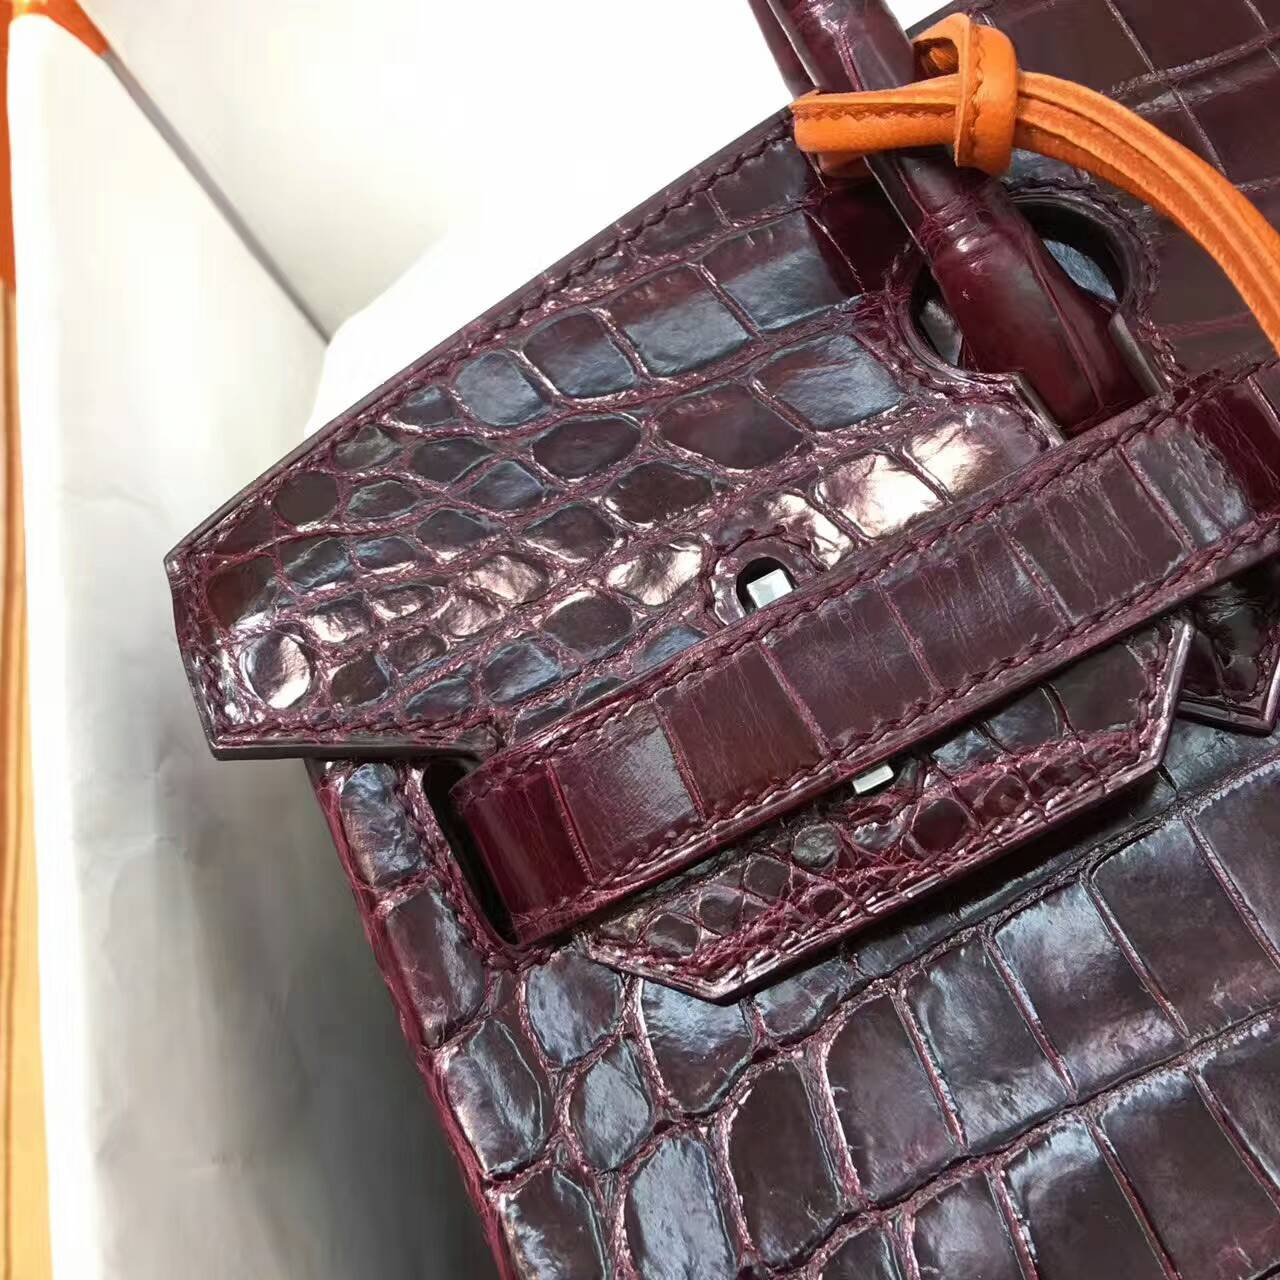 Birkin铂金包 Hermes包包 30cm Shiny Niloticus Crocodile 亮面两点非洲原产尼罗鳄 57 Bordeaux 波尔多酒红 银扣